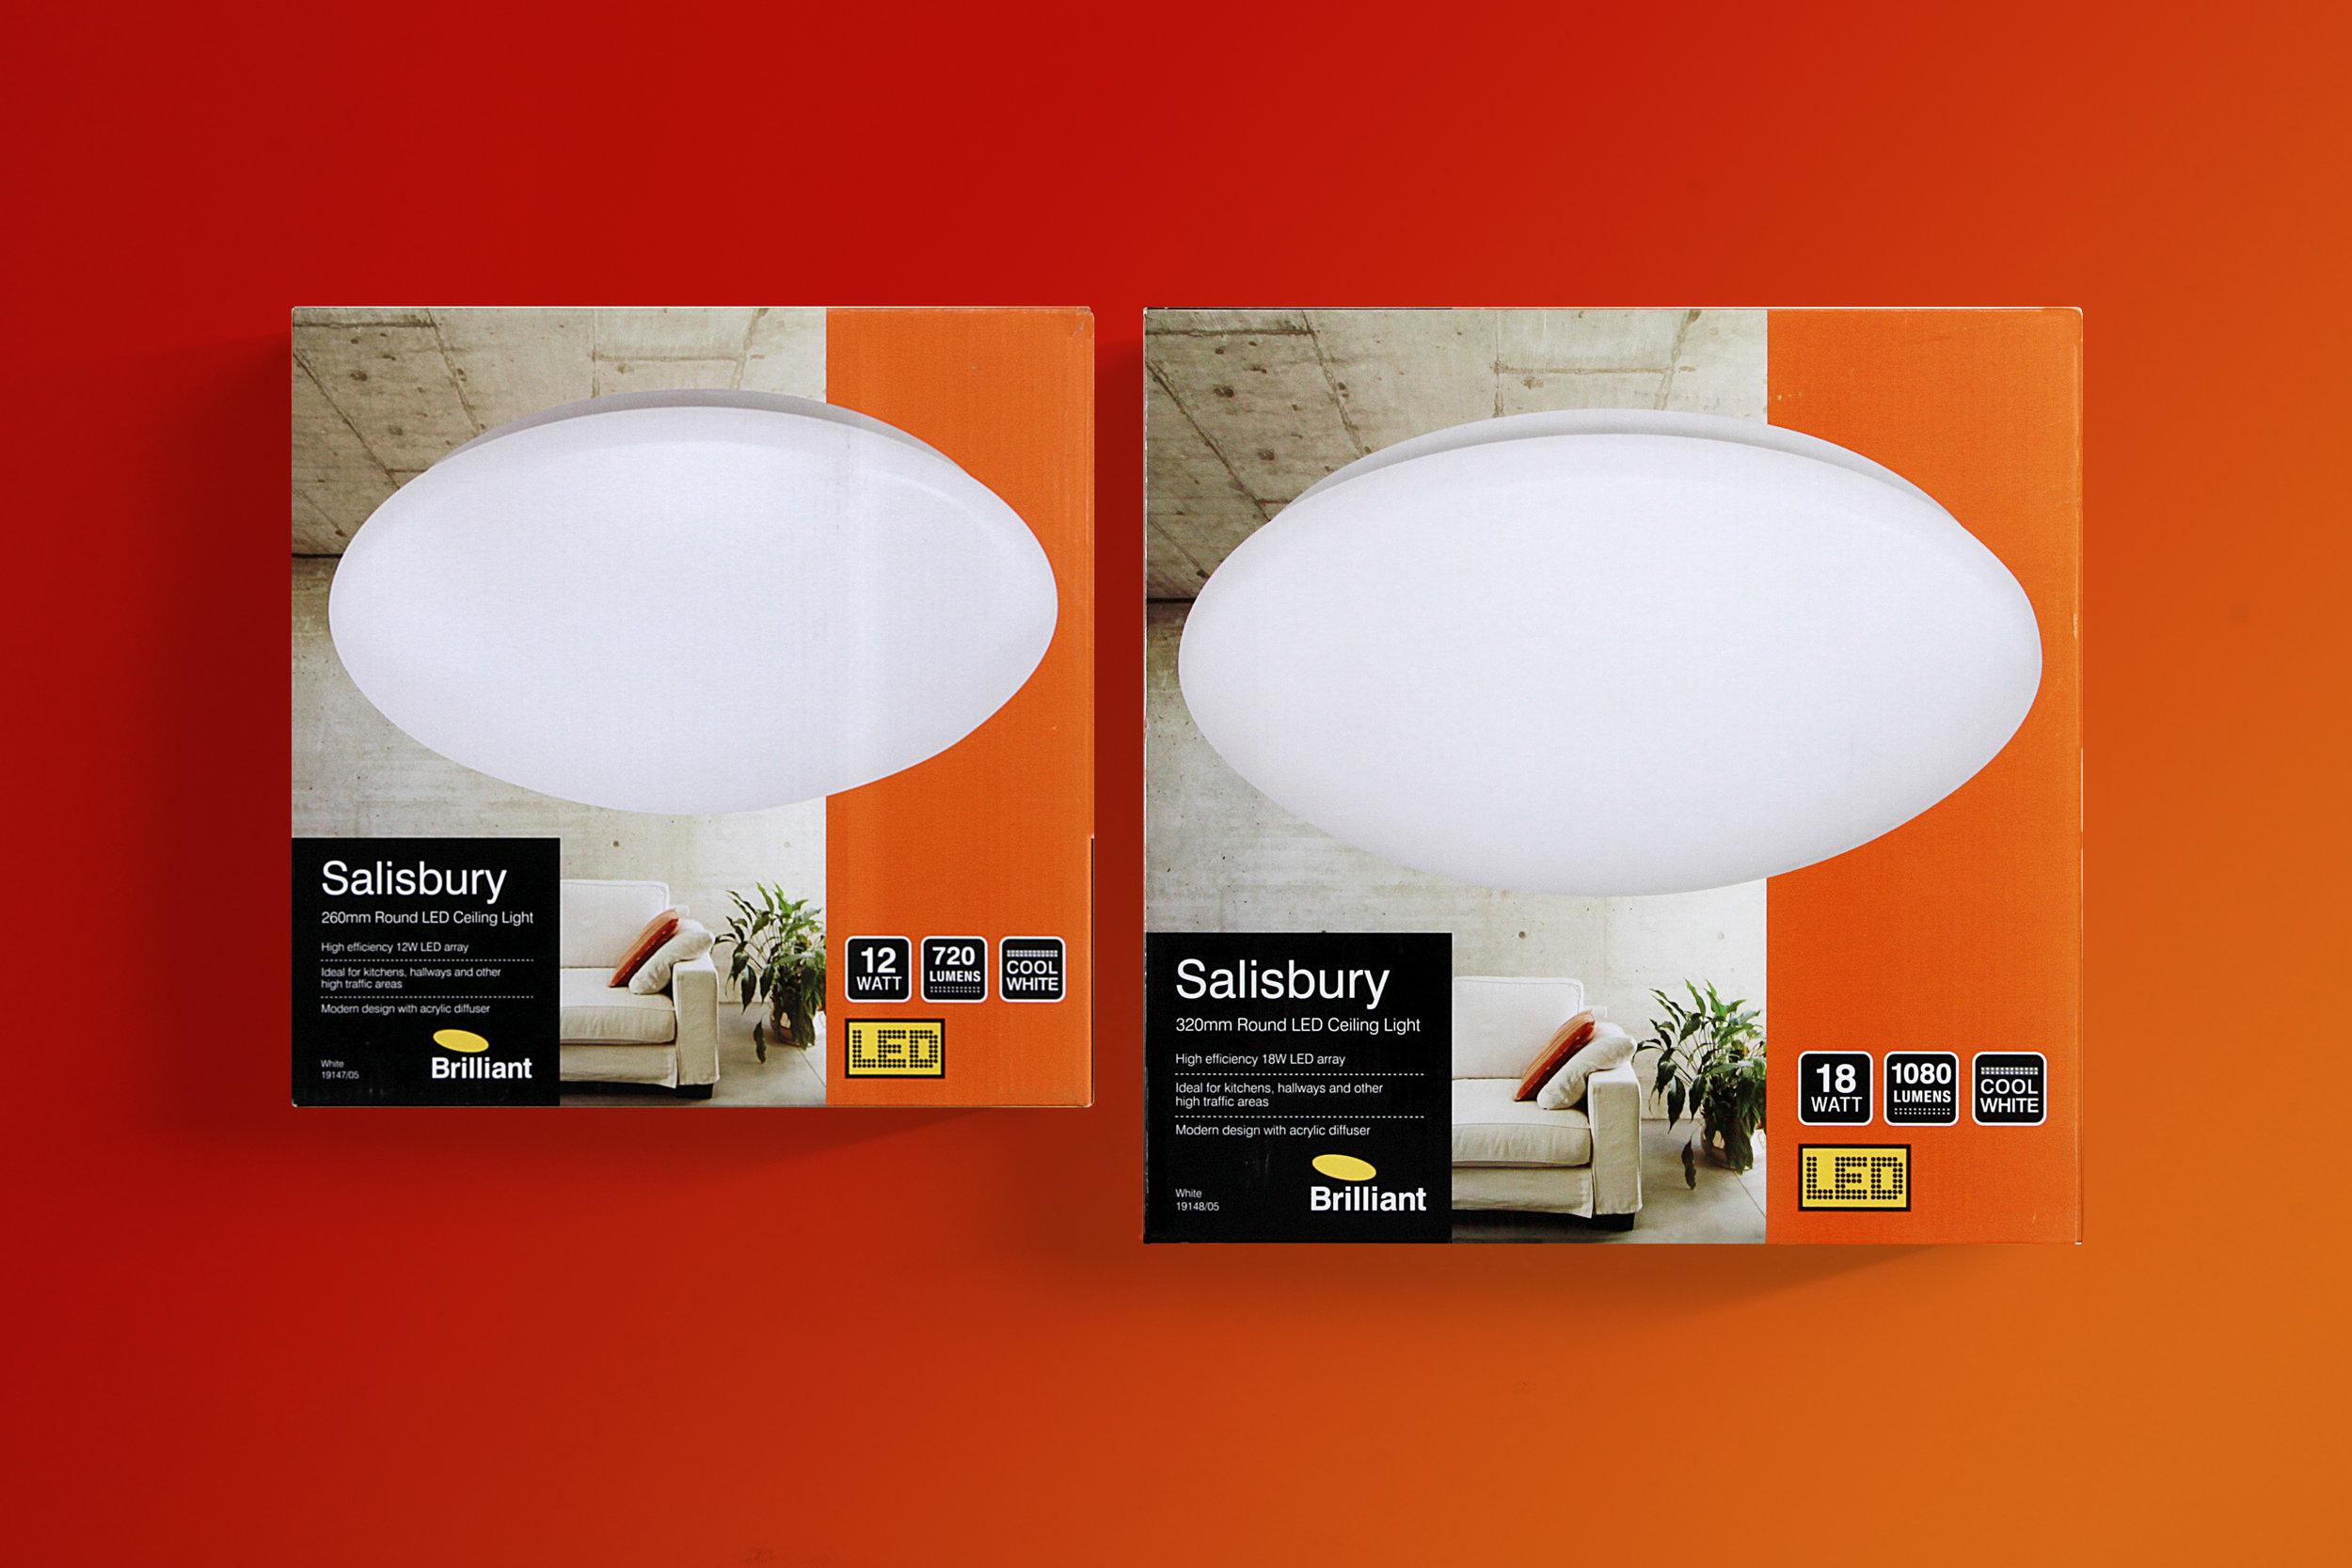 FIFI OKTOVIANUS CREATIVE - 18 brilliant packaging designs